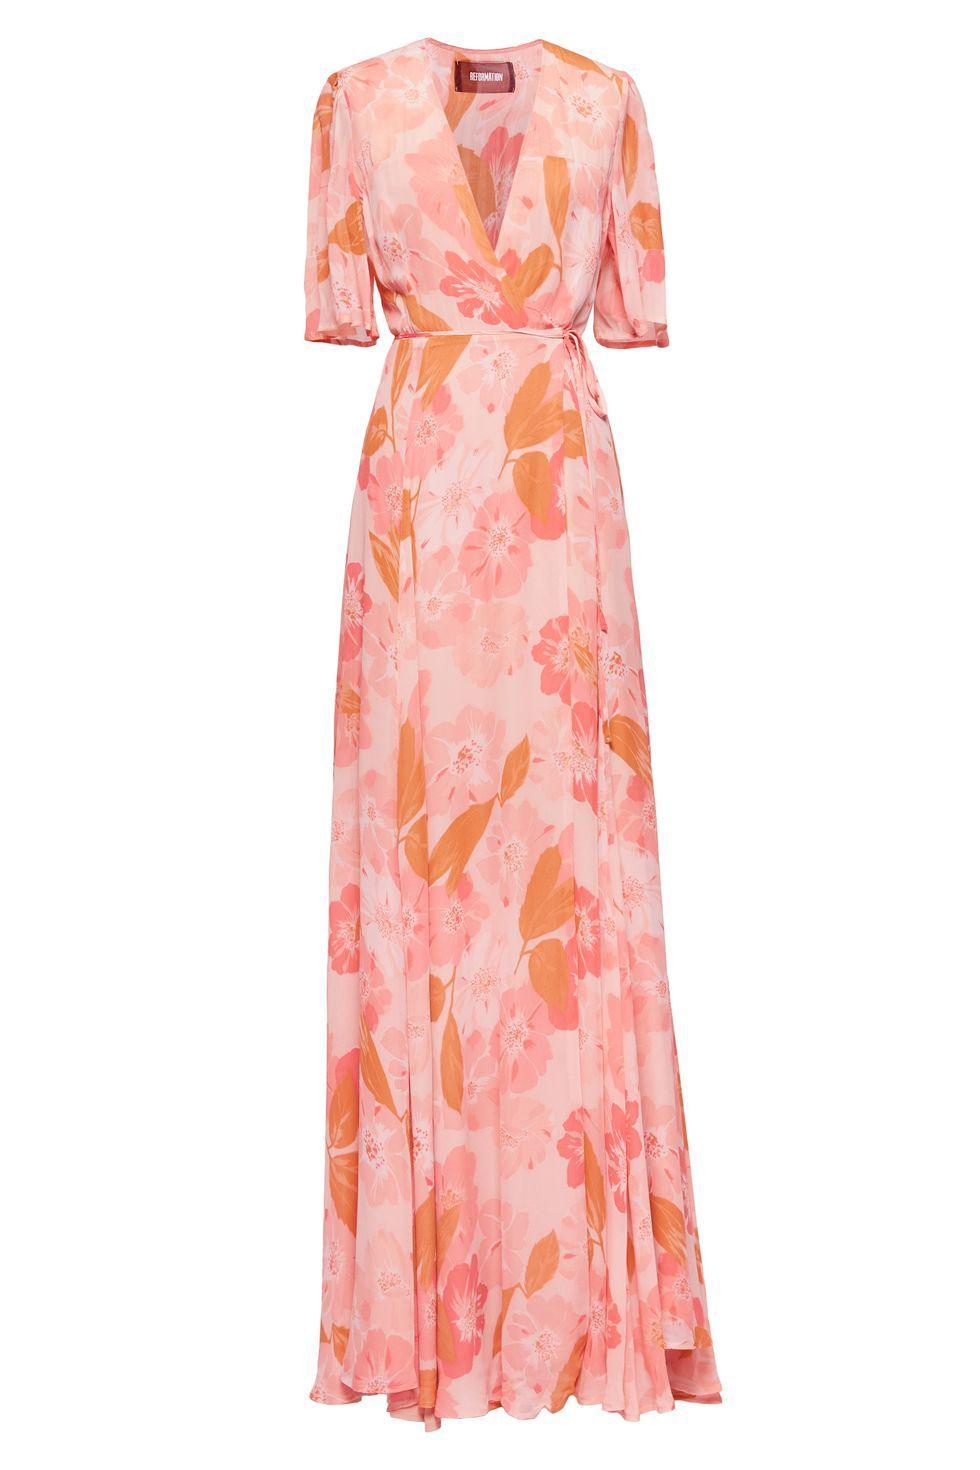 Best dresses to wear to a beach wedding   Dresses to Wear to Your Best Friendus Beach Wedding  Beach